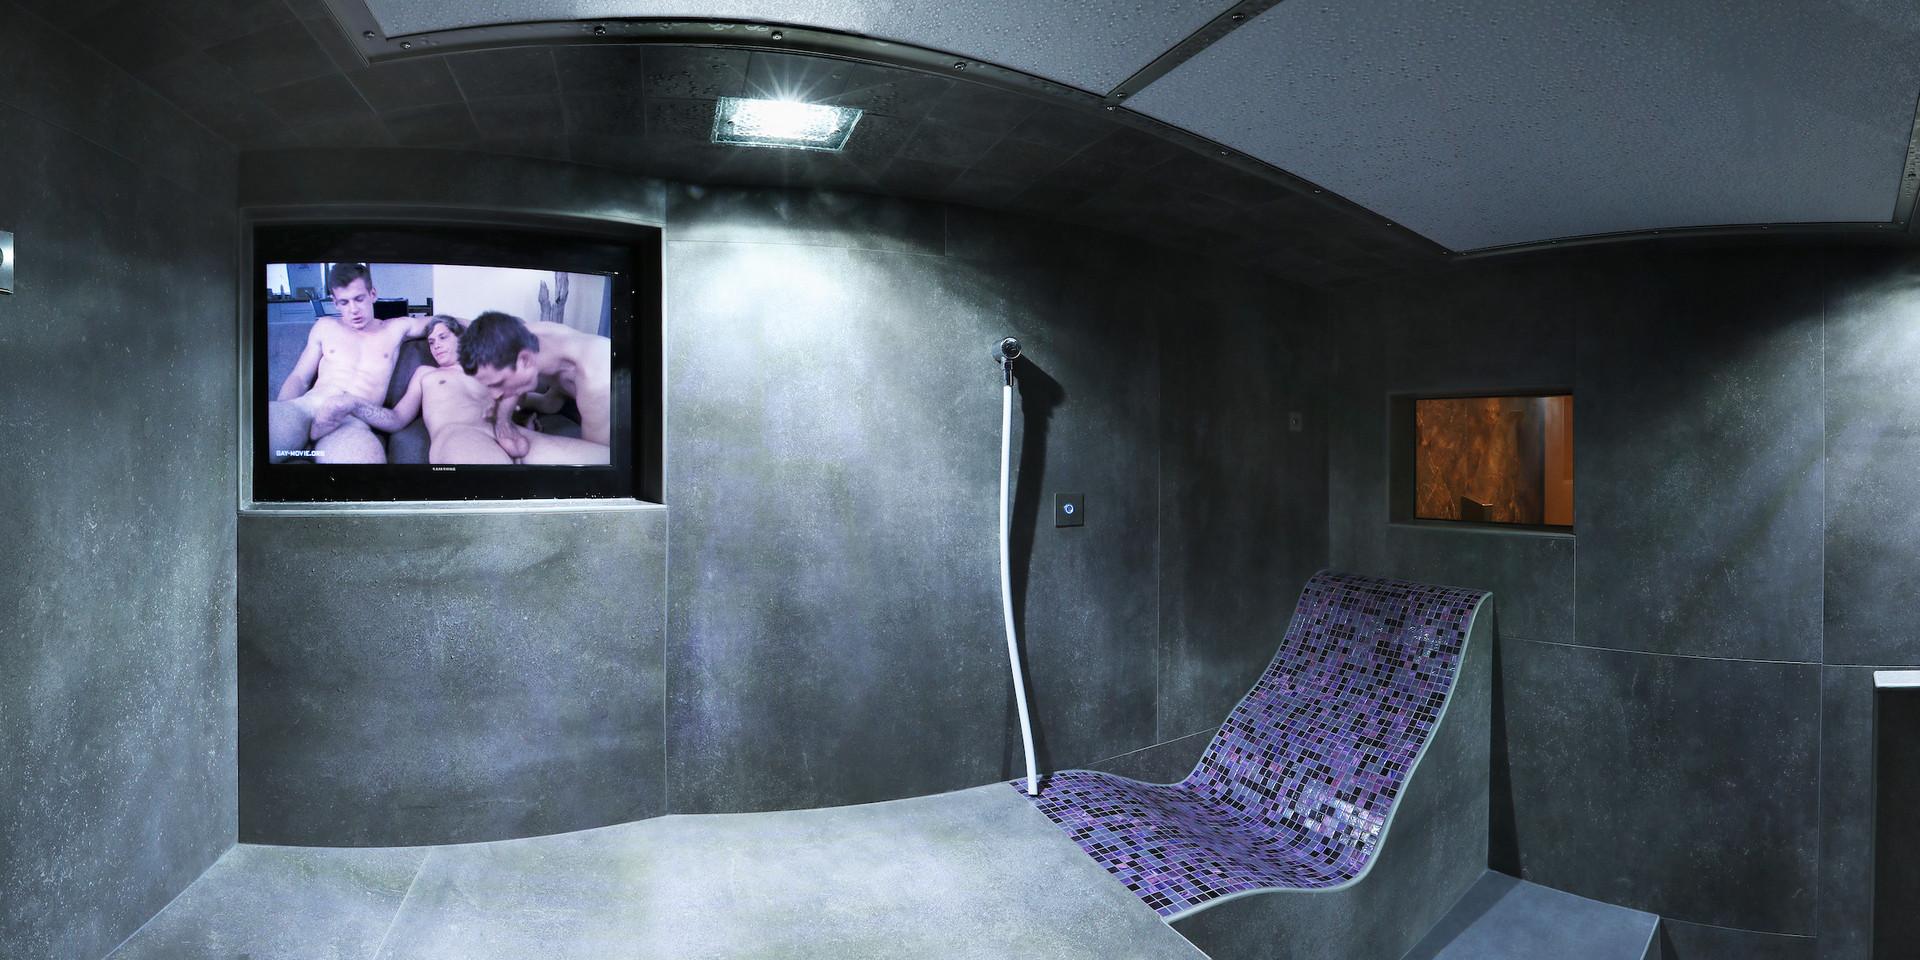 gay-sauna-renos-relax-club-steam